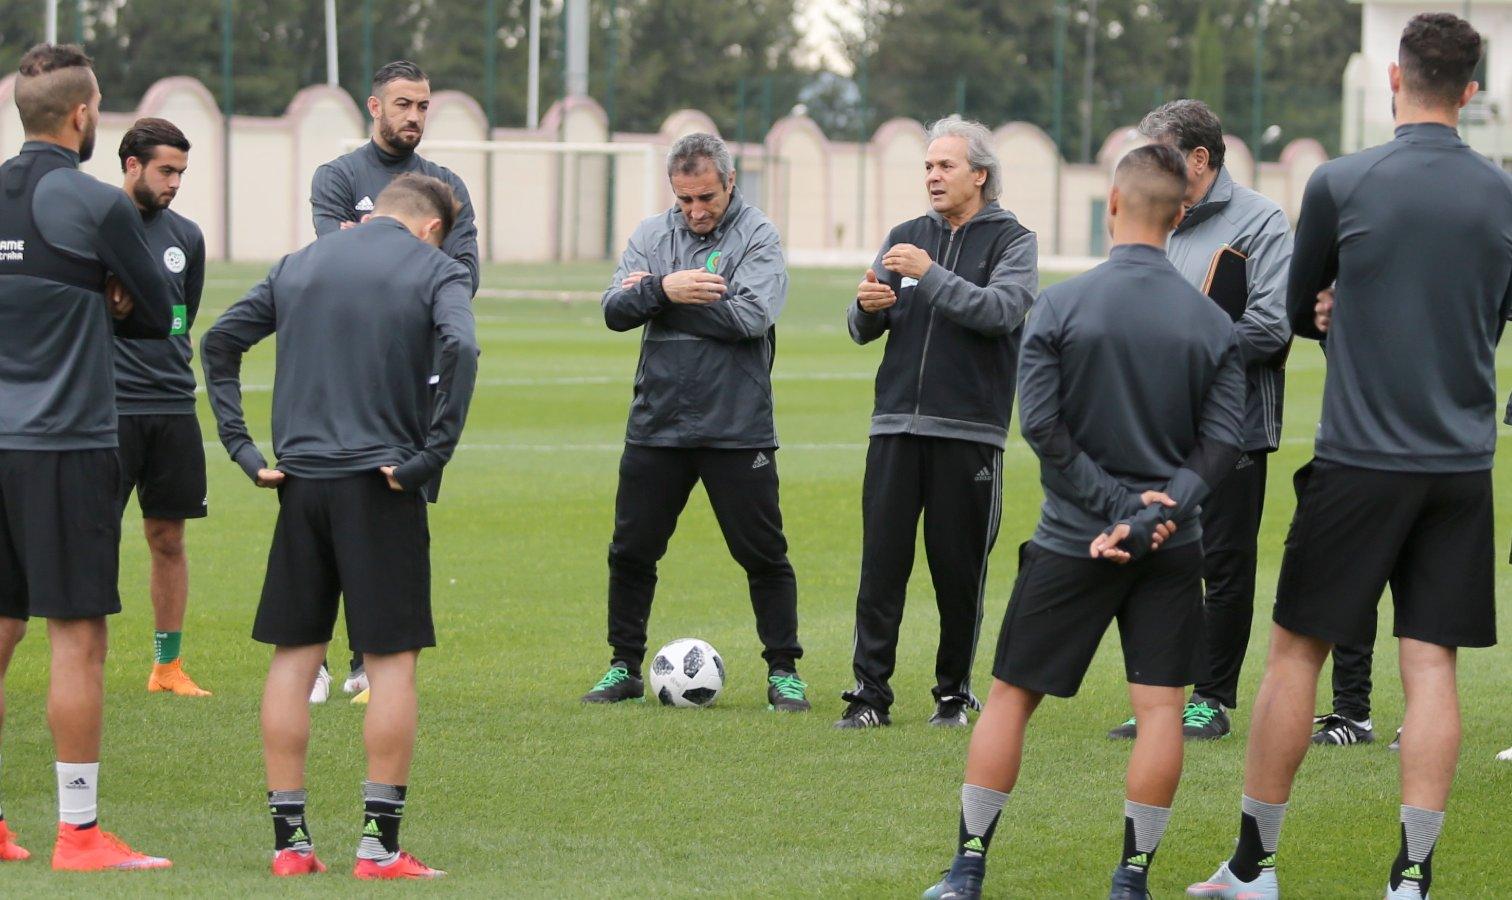 Des arbitres espagnols pour l'amical Arabie saoudite-Algérie A' mercredi à Cadix